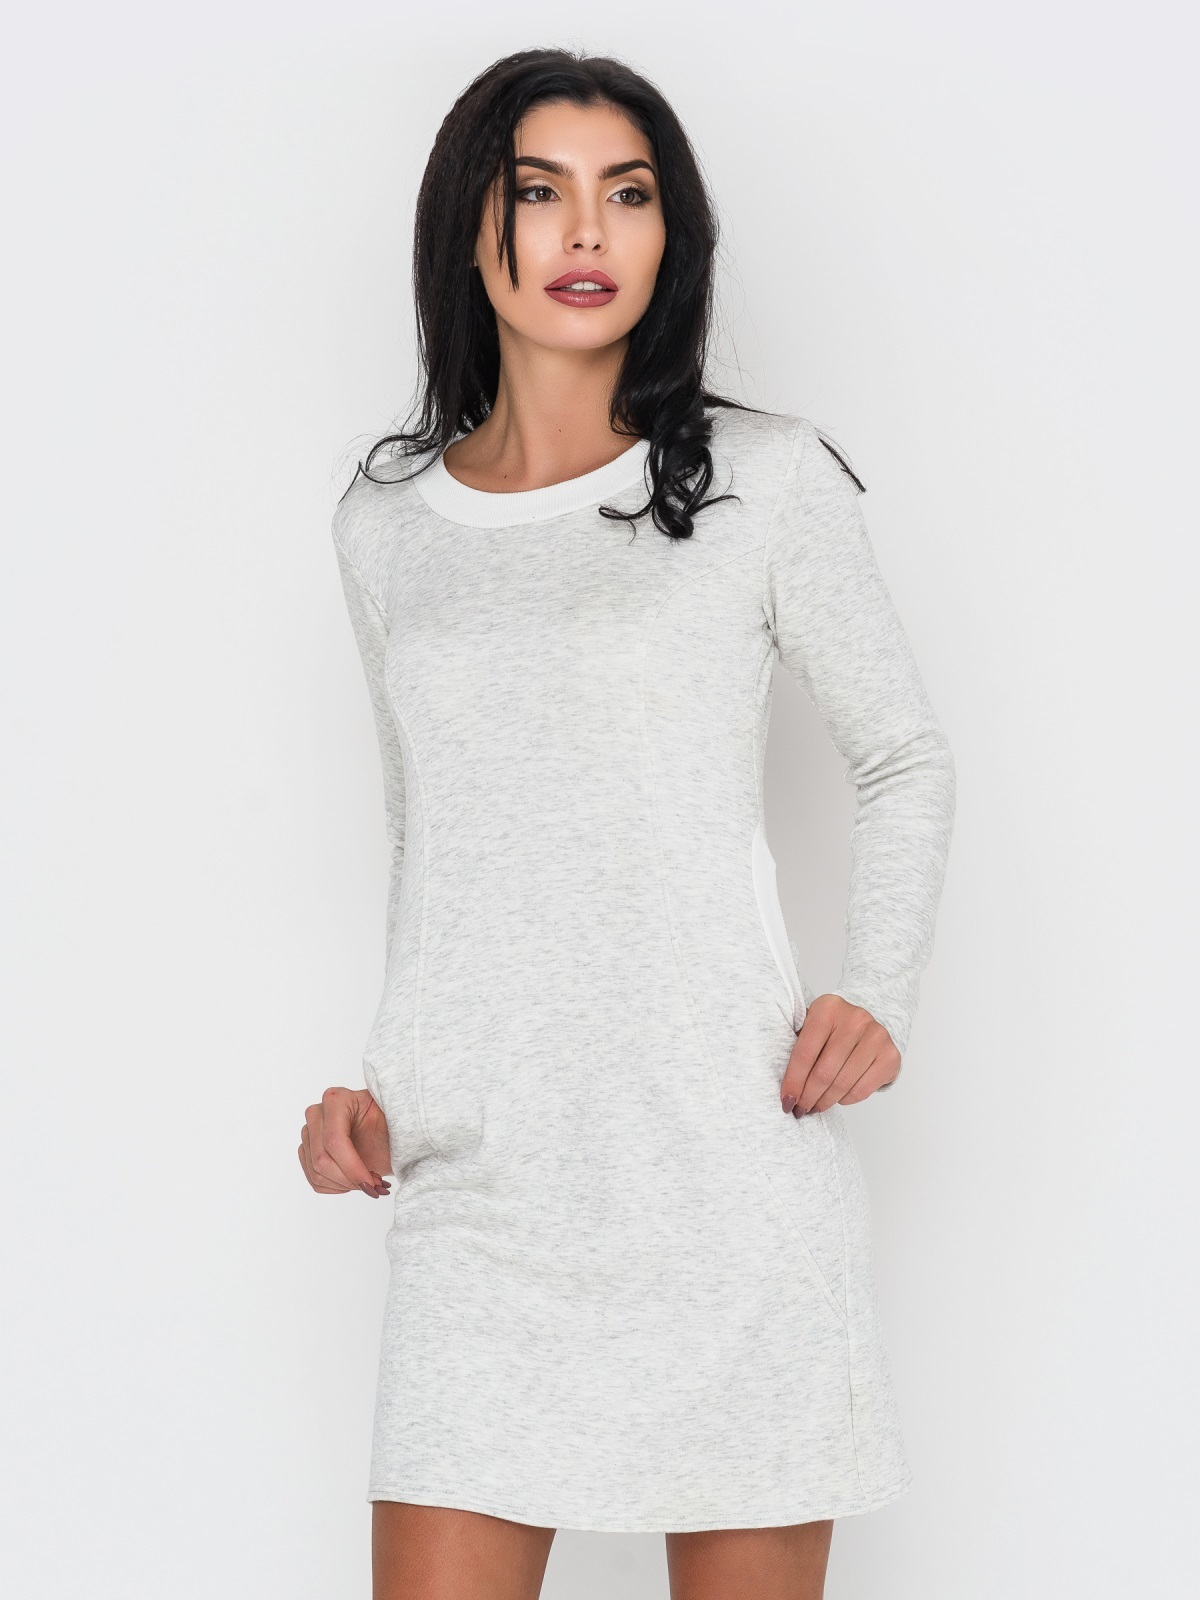 Платье на флисе 66217